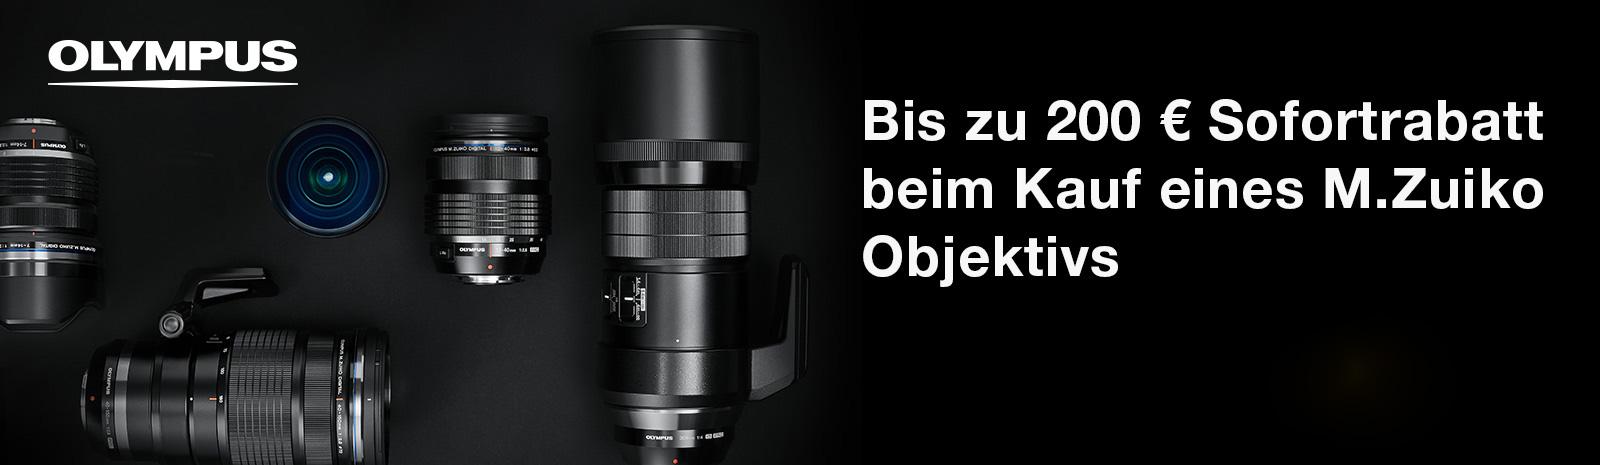 Olympus Objektiv Promotion